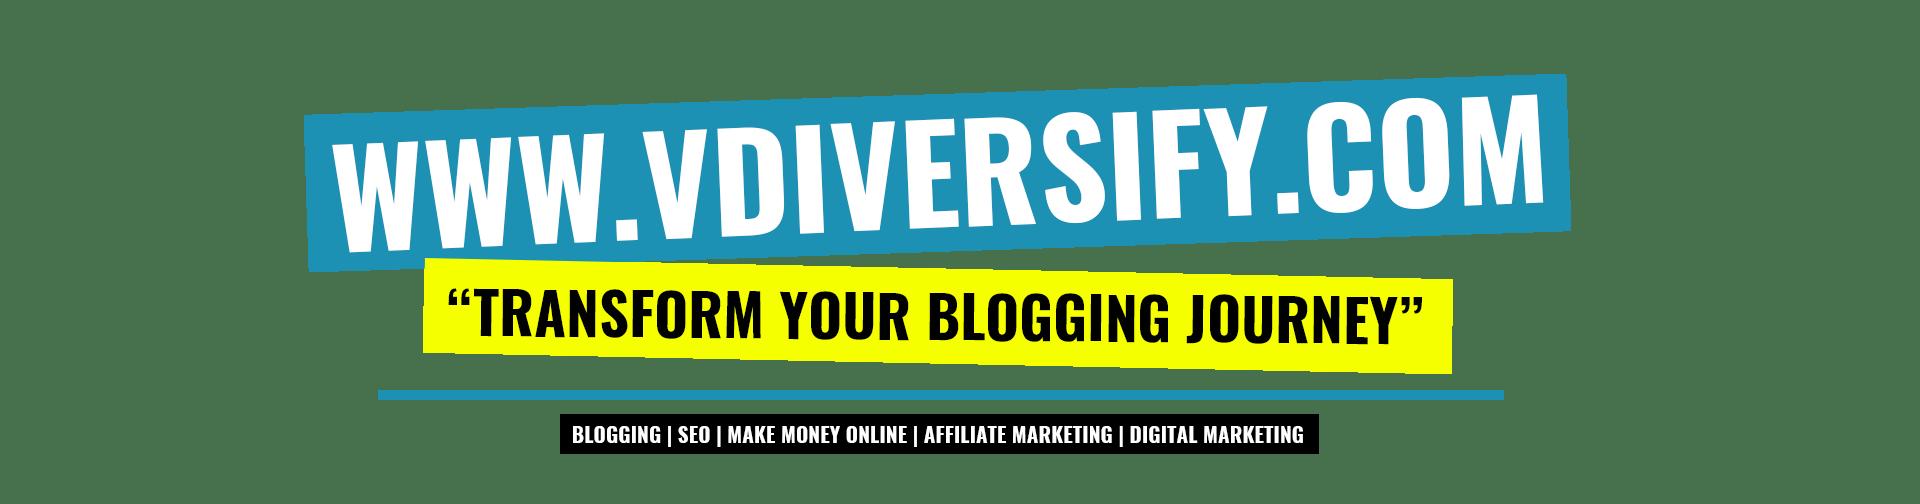 VDiversify_Transform_Your_Blogging_Journey